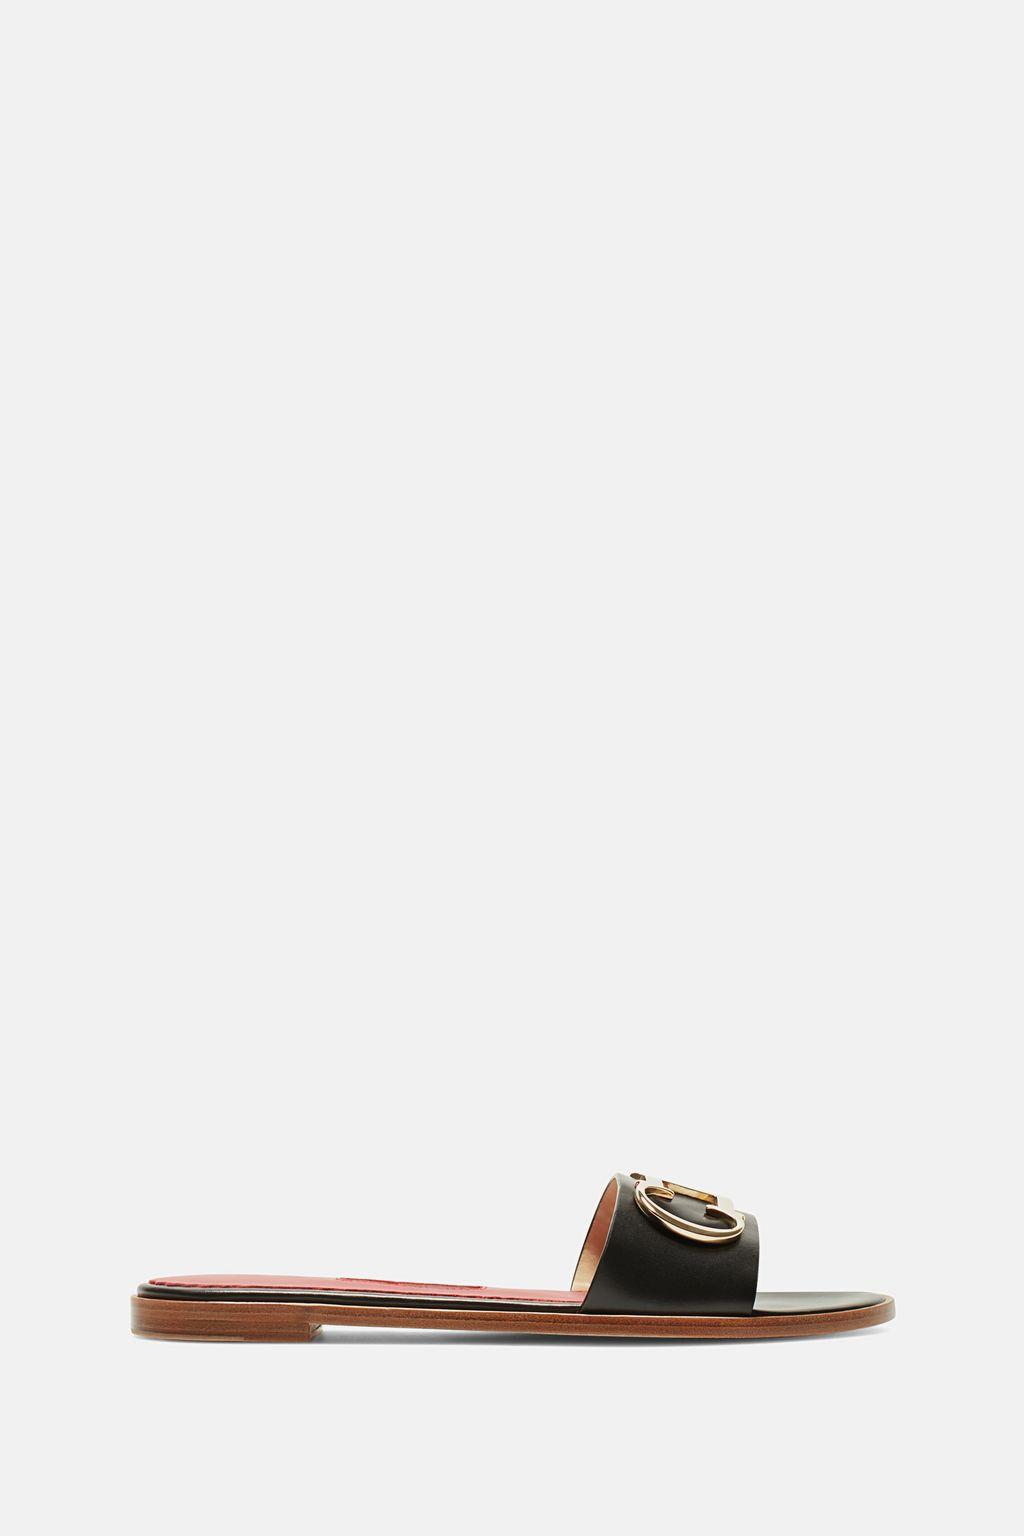 Initials Insignia leather slides